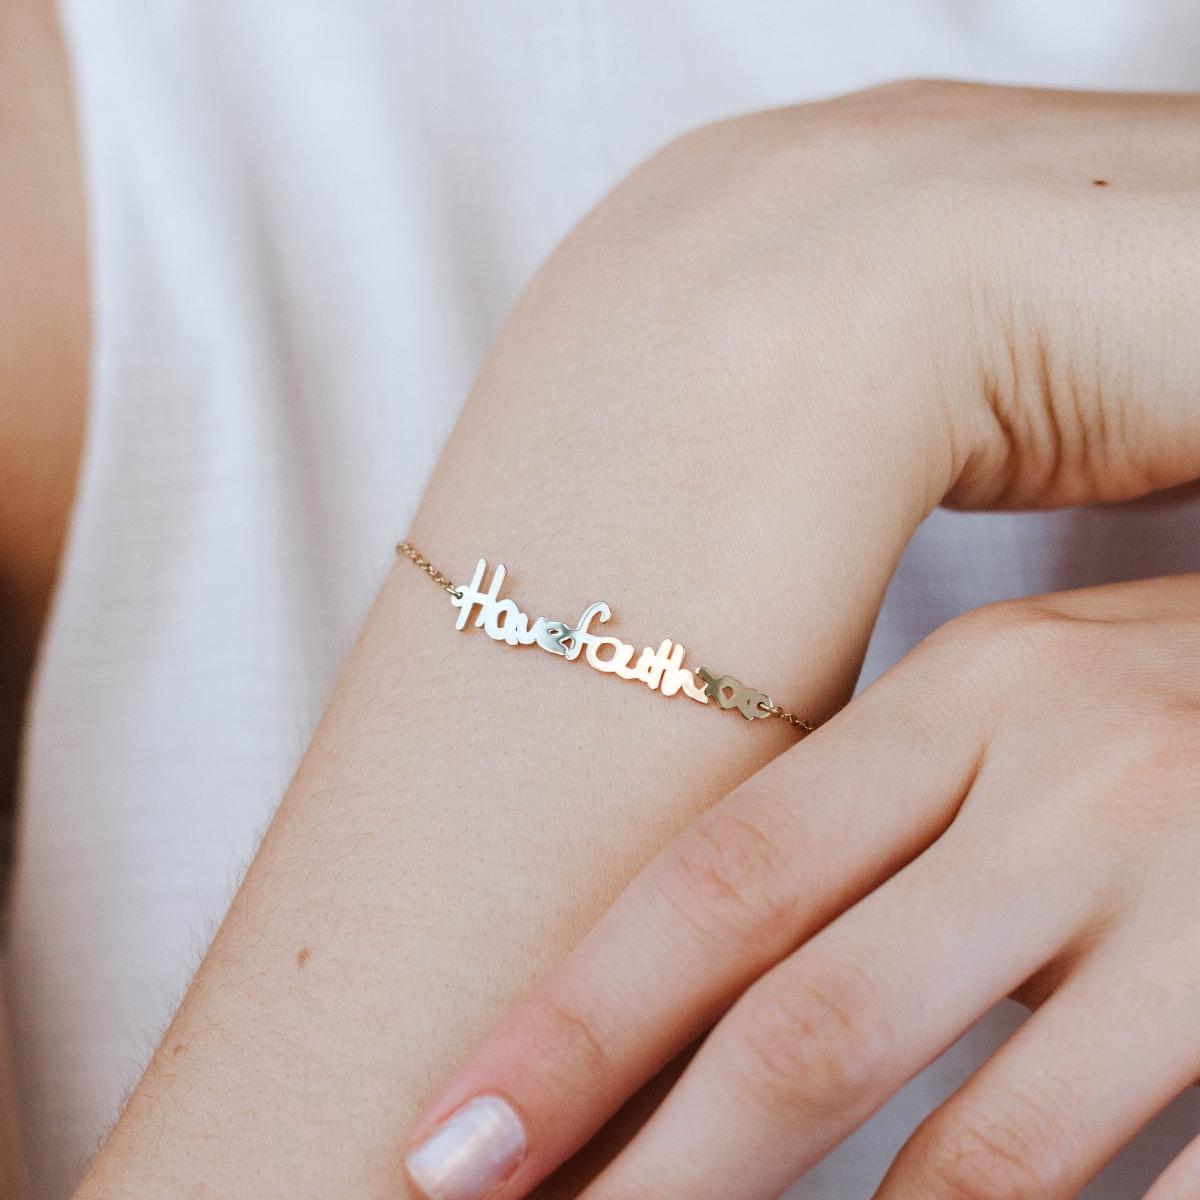 Actual Handwriting Bracelet Silver